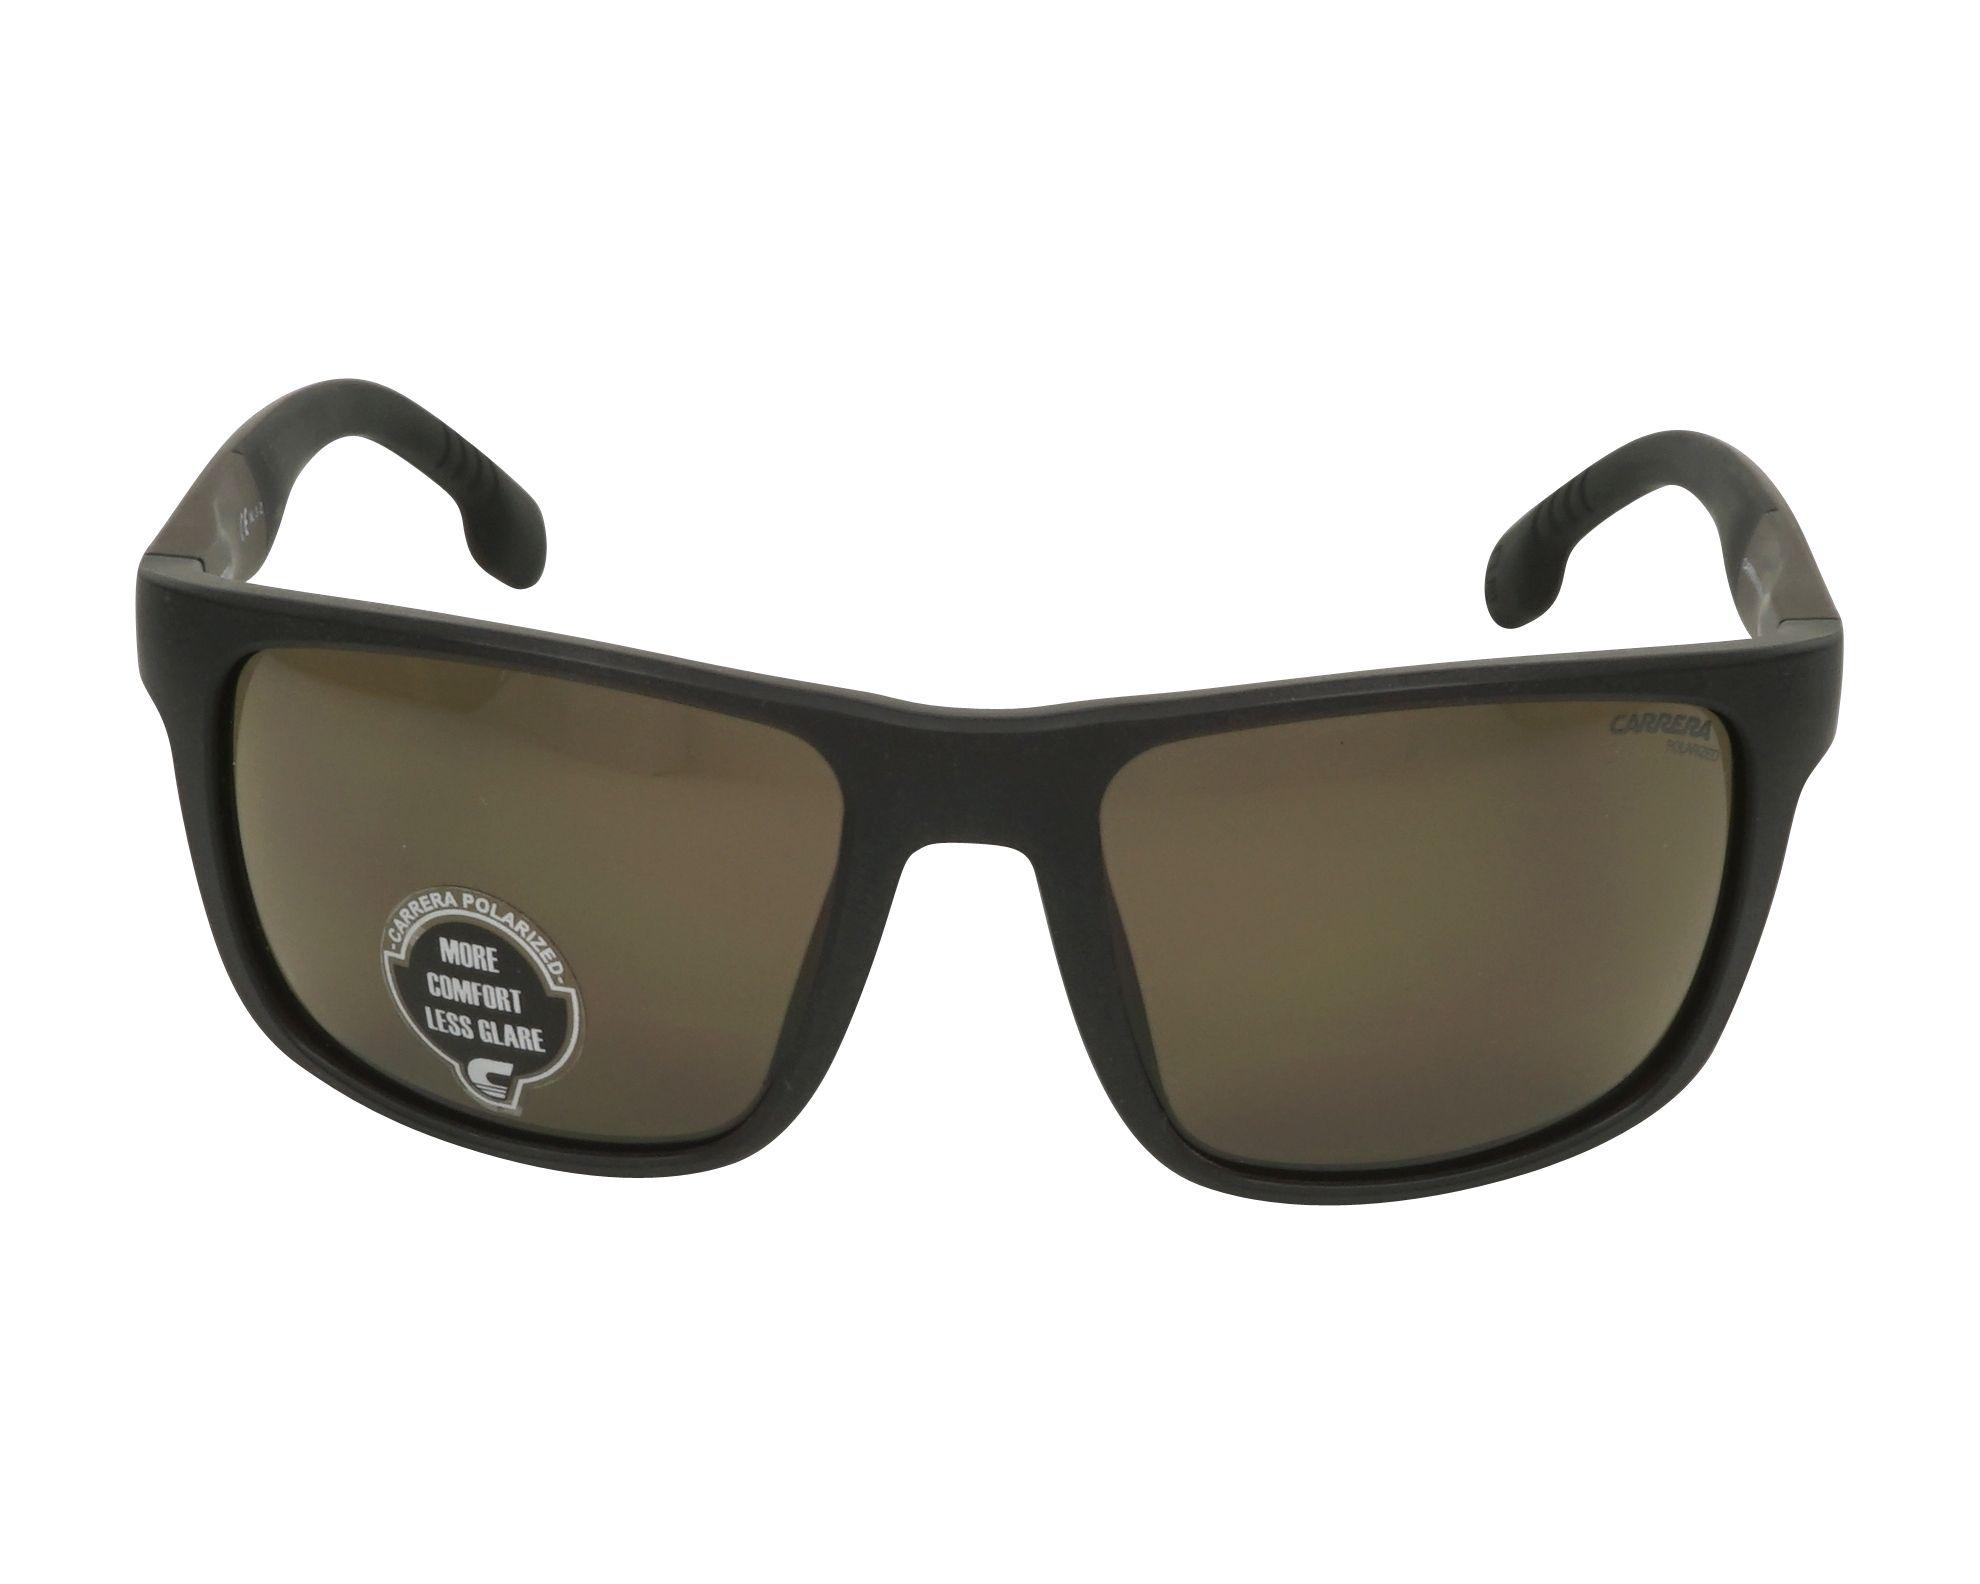 b60b2ac18d7 Sunglasses Carrera 8027-S 09Q SP 57-19 Black Brown front view